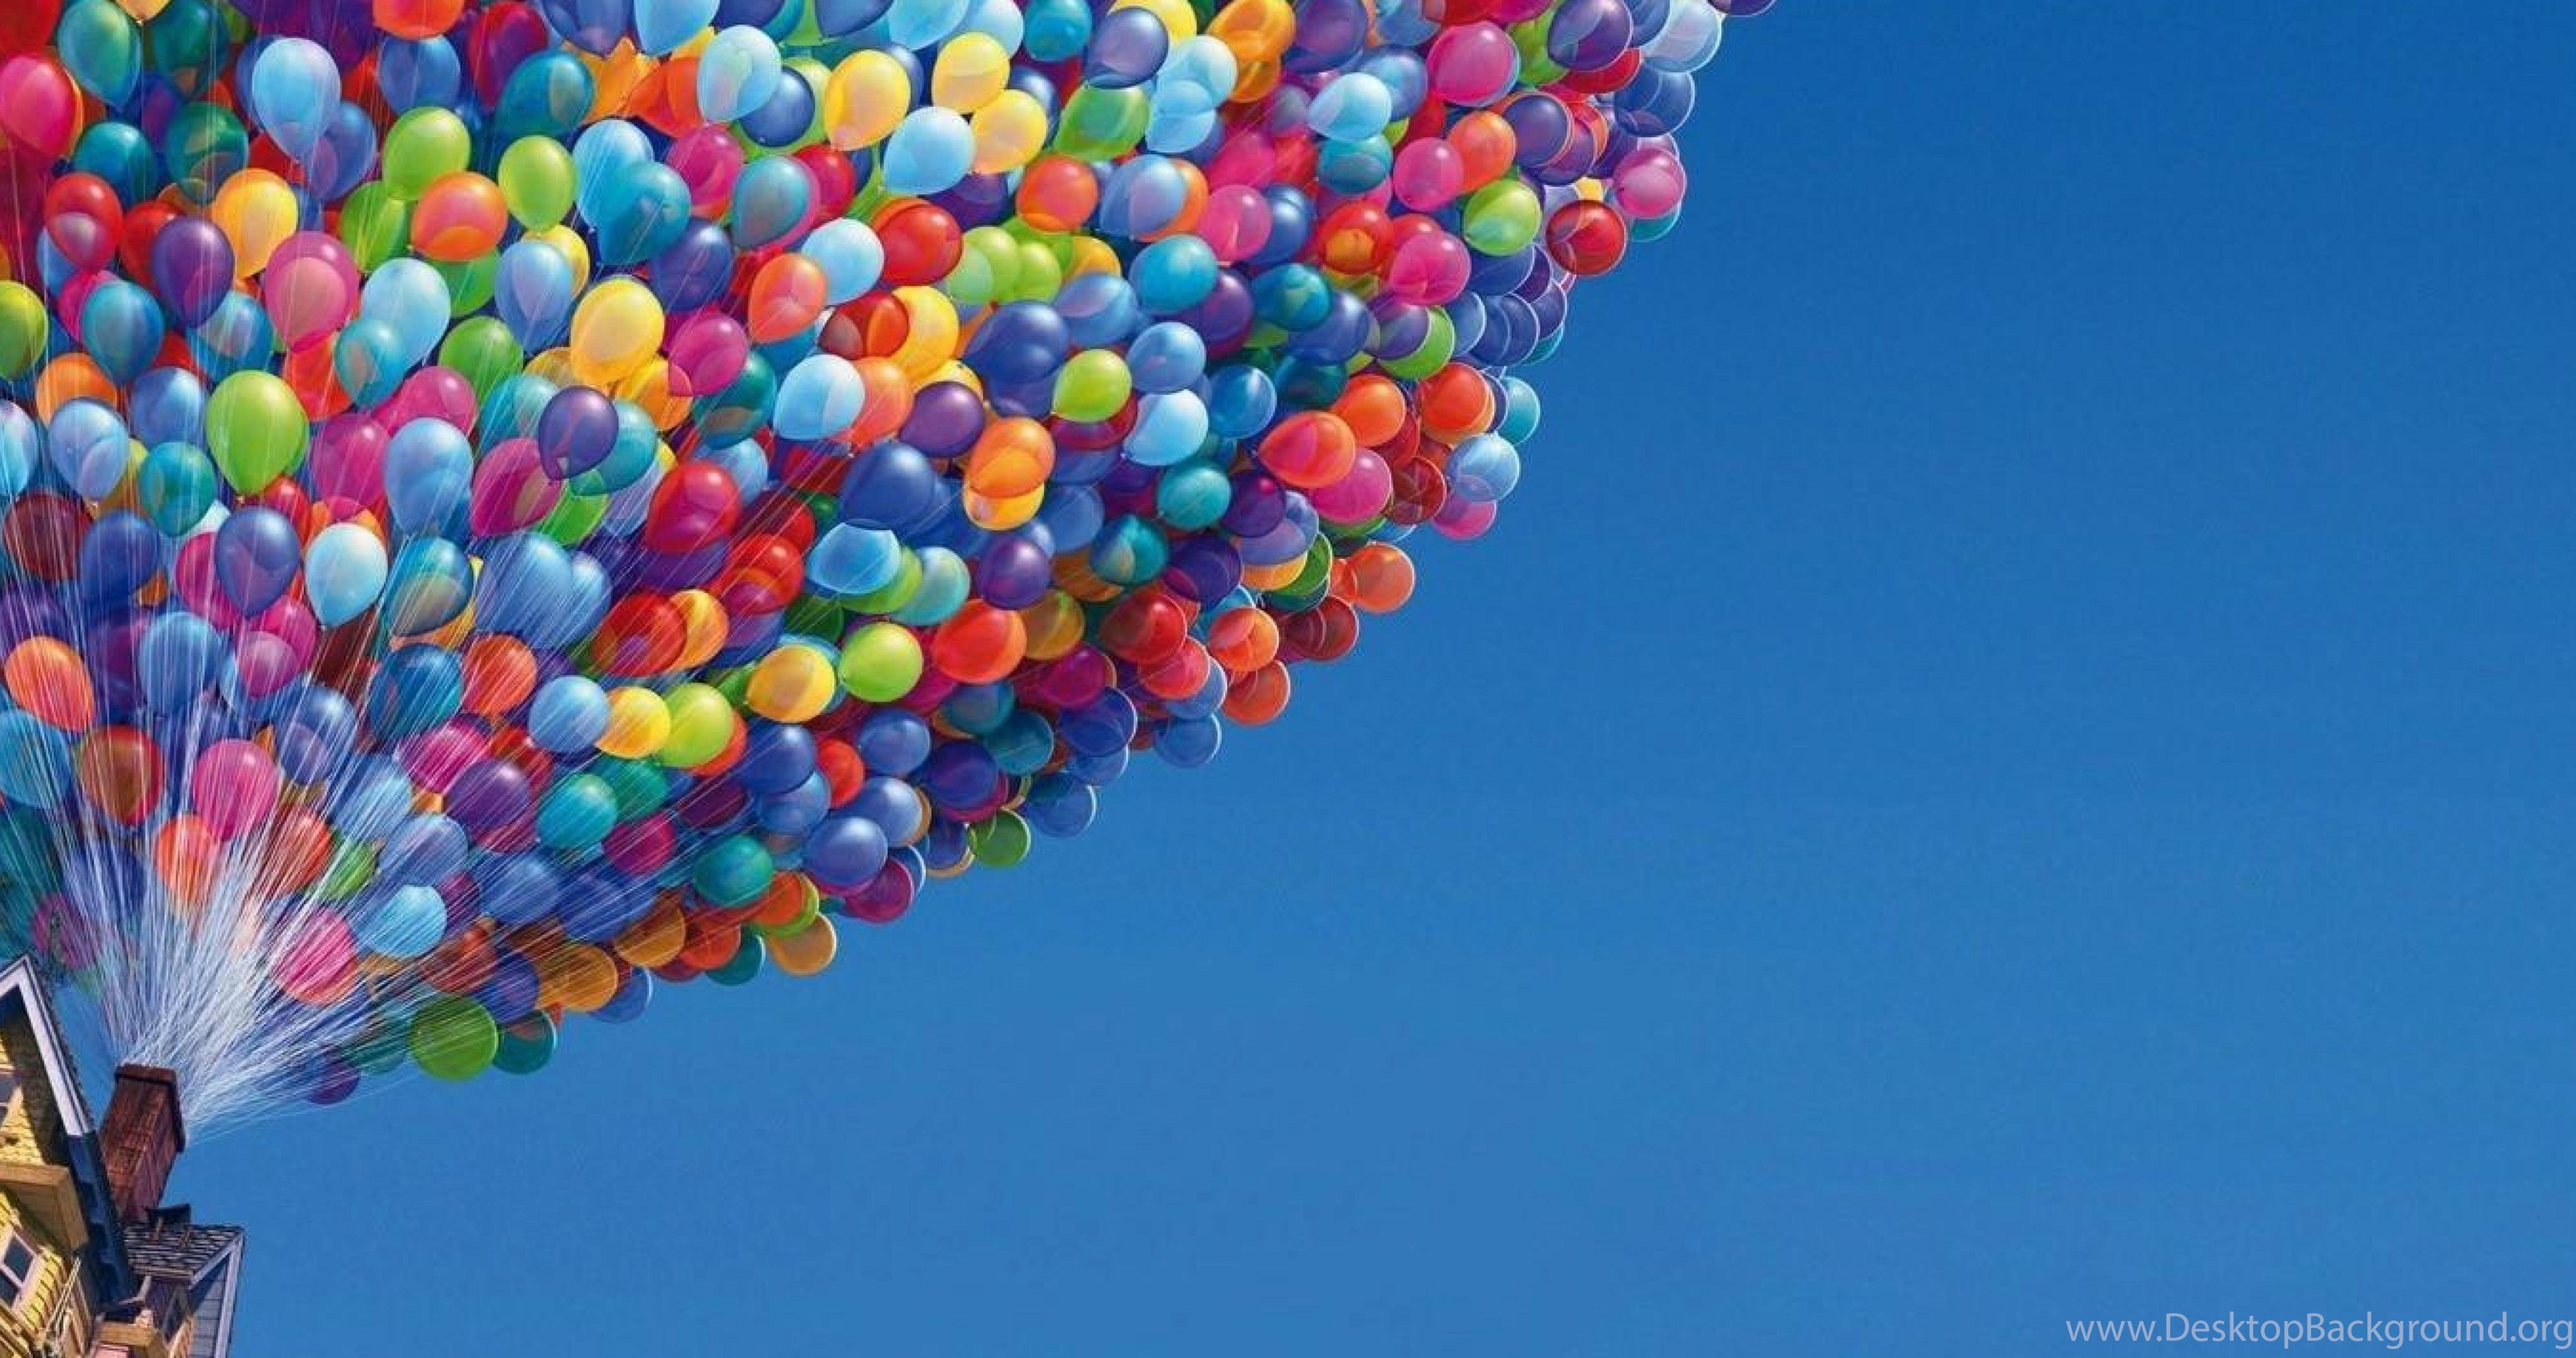 House With Balloons Up Pixar Cartoons Up Hd Wallpapers Desktop Up Wallpaper Hd 4096x2160 Download Hd Wallpaper Wallpapertip